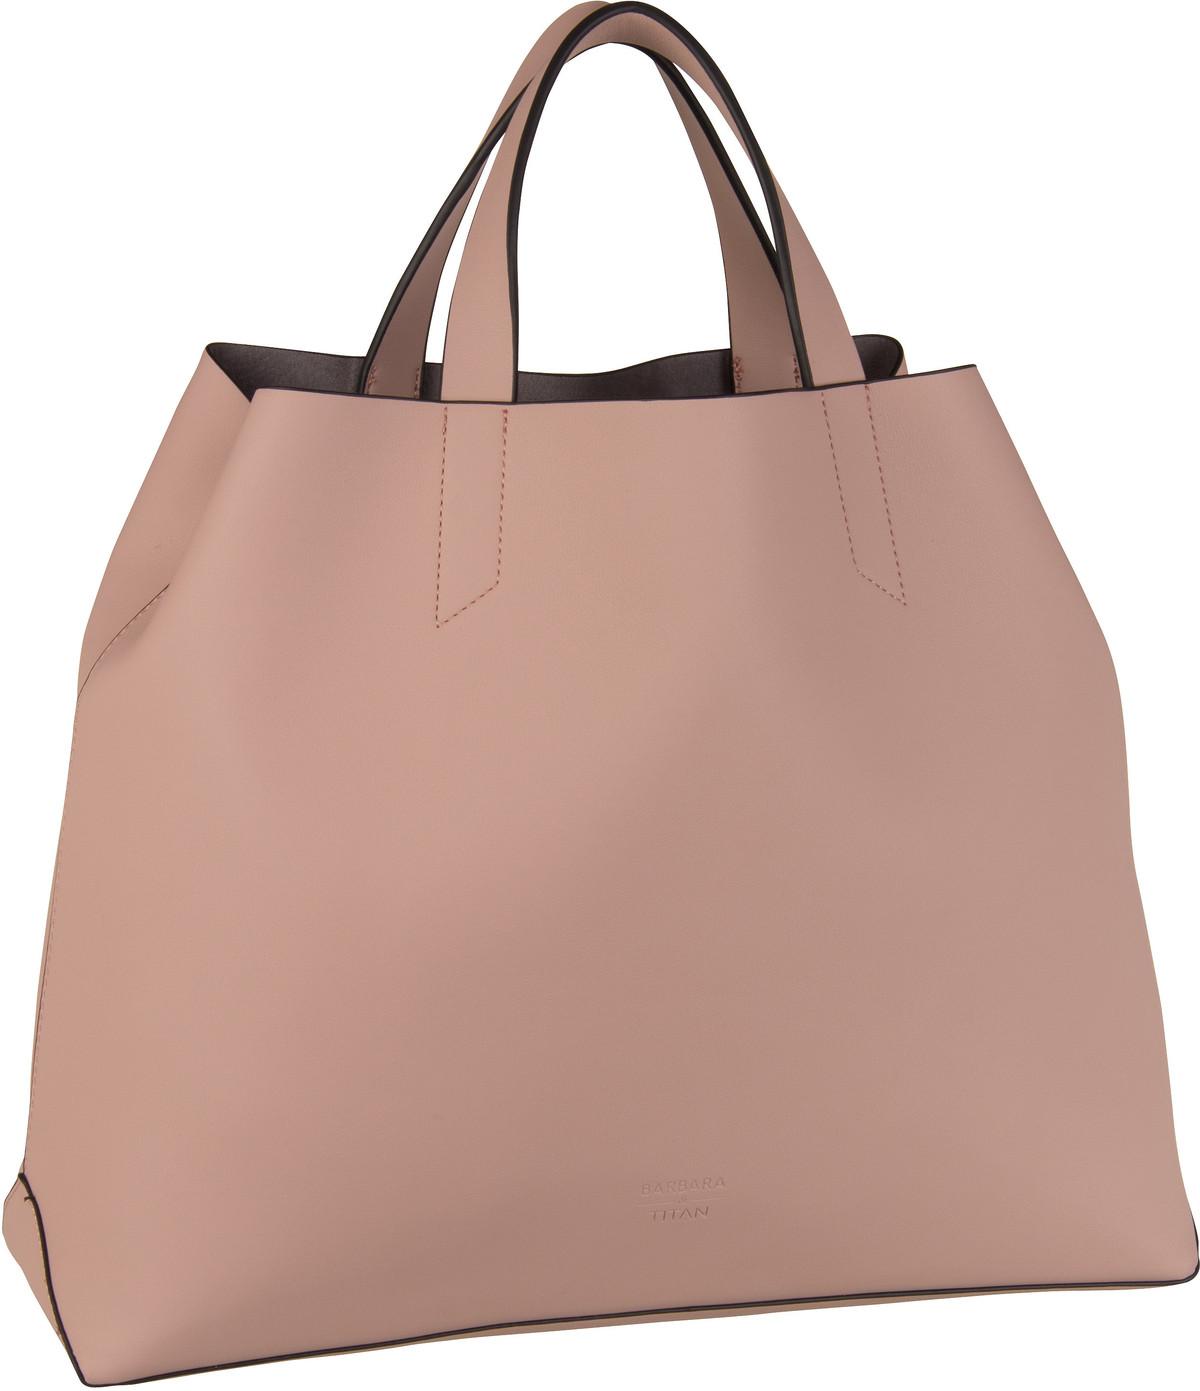 Handtasche Barbara Pure Handbag Rose (16 Liter)